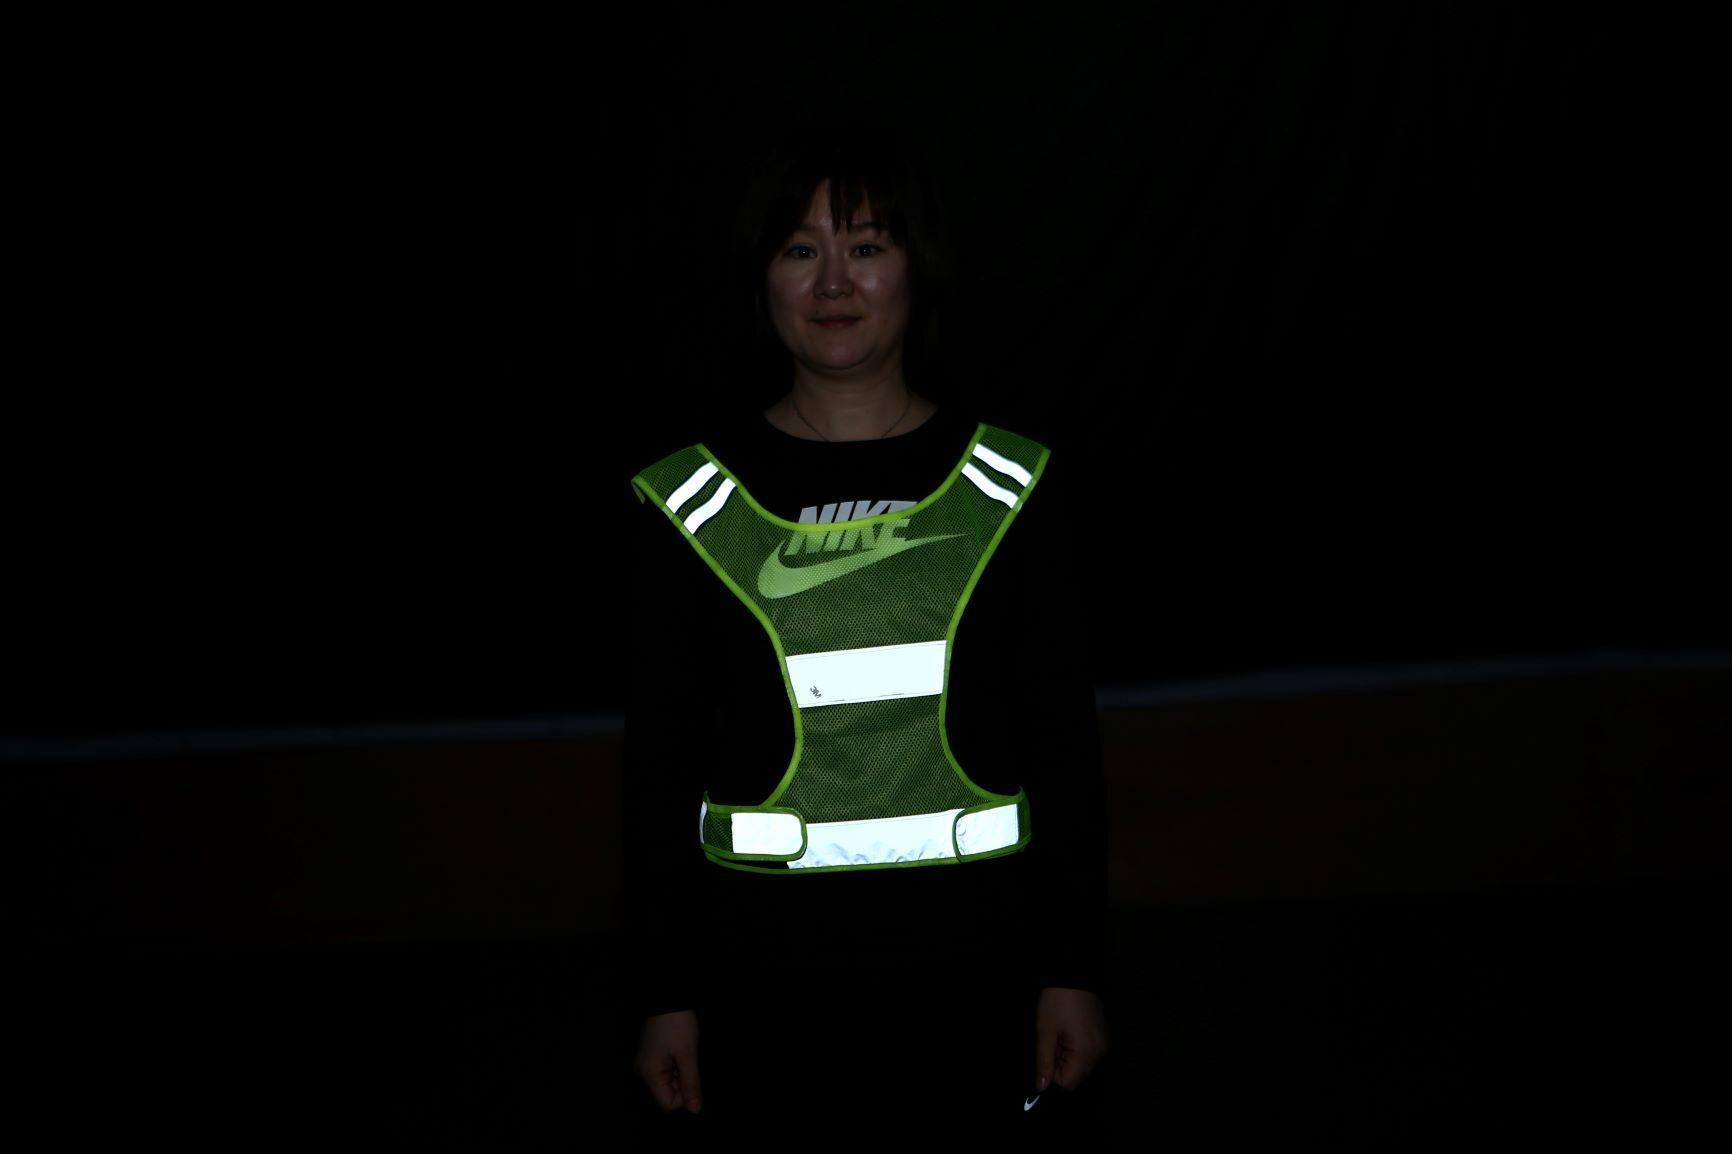 Safety Vest for Running